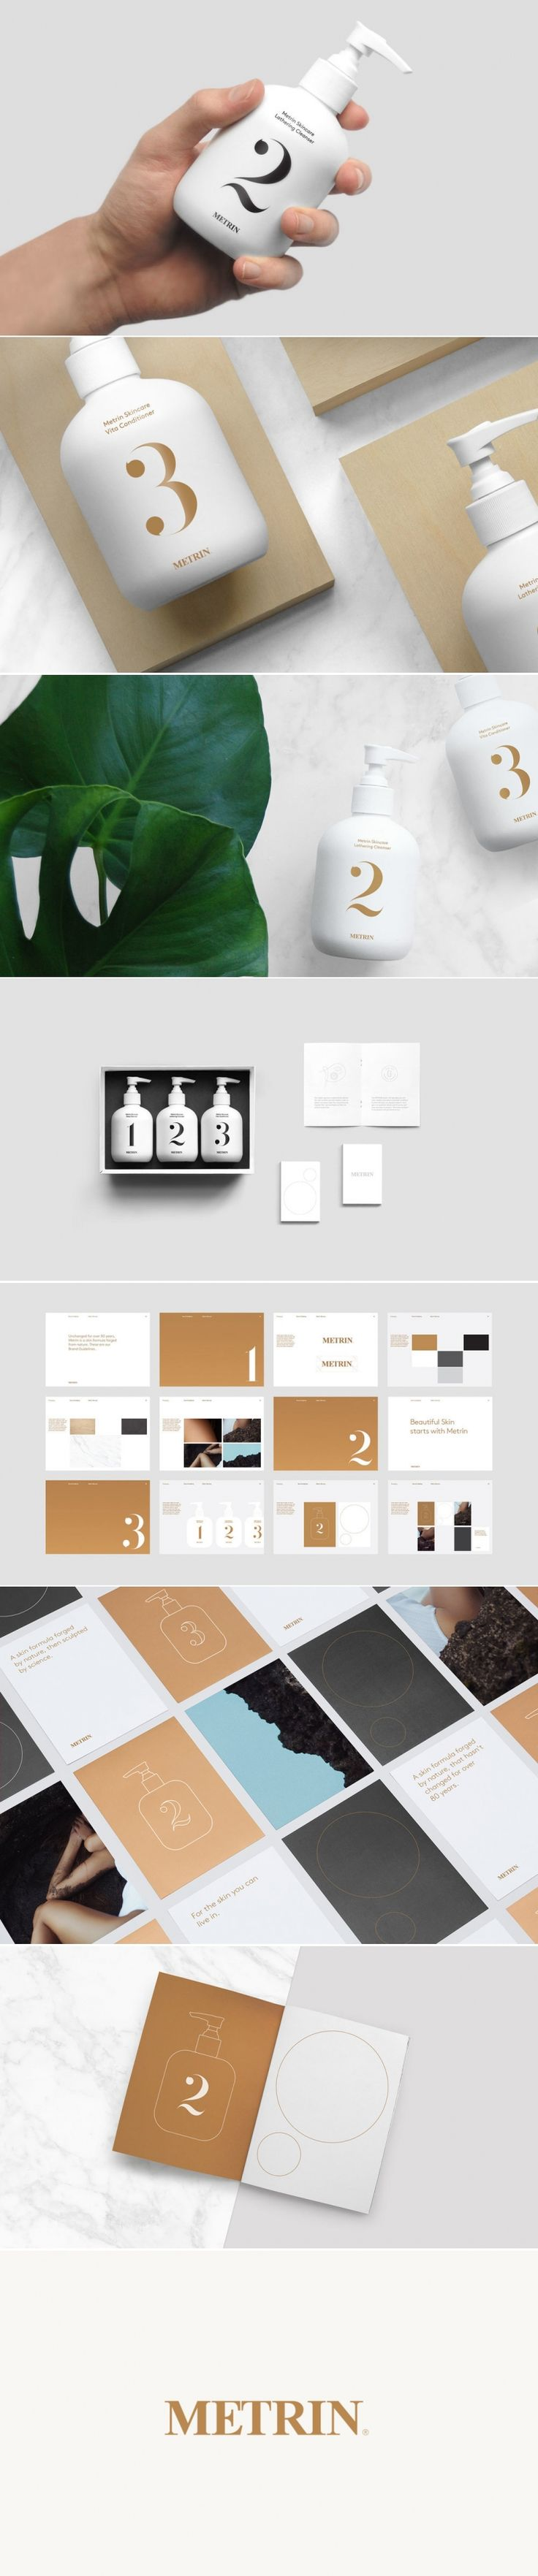 Metrin's Beautiful Minimalistic Skincare Packaging — The Dieline | Packaging & Branding Design & Innovation News